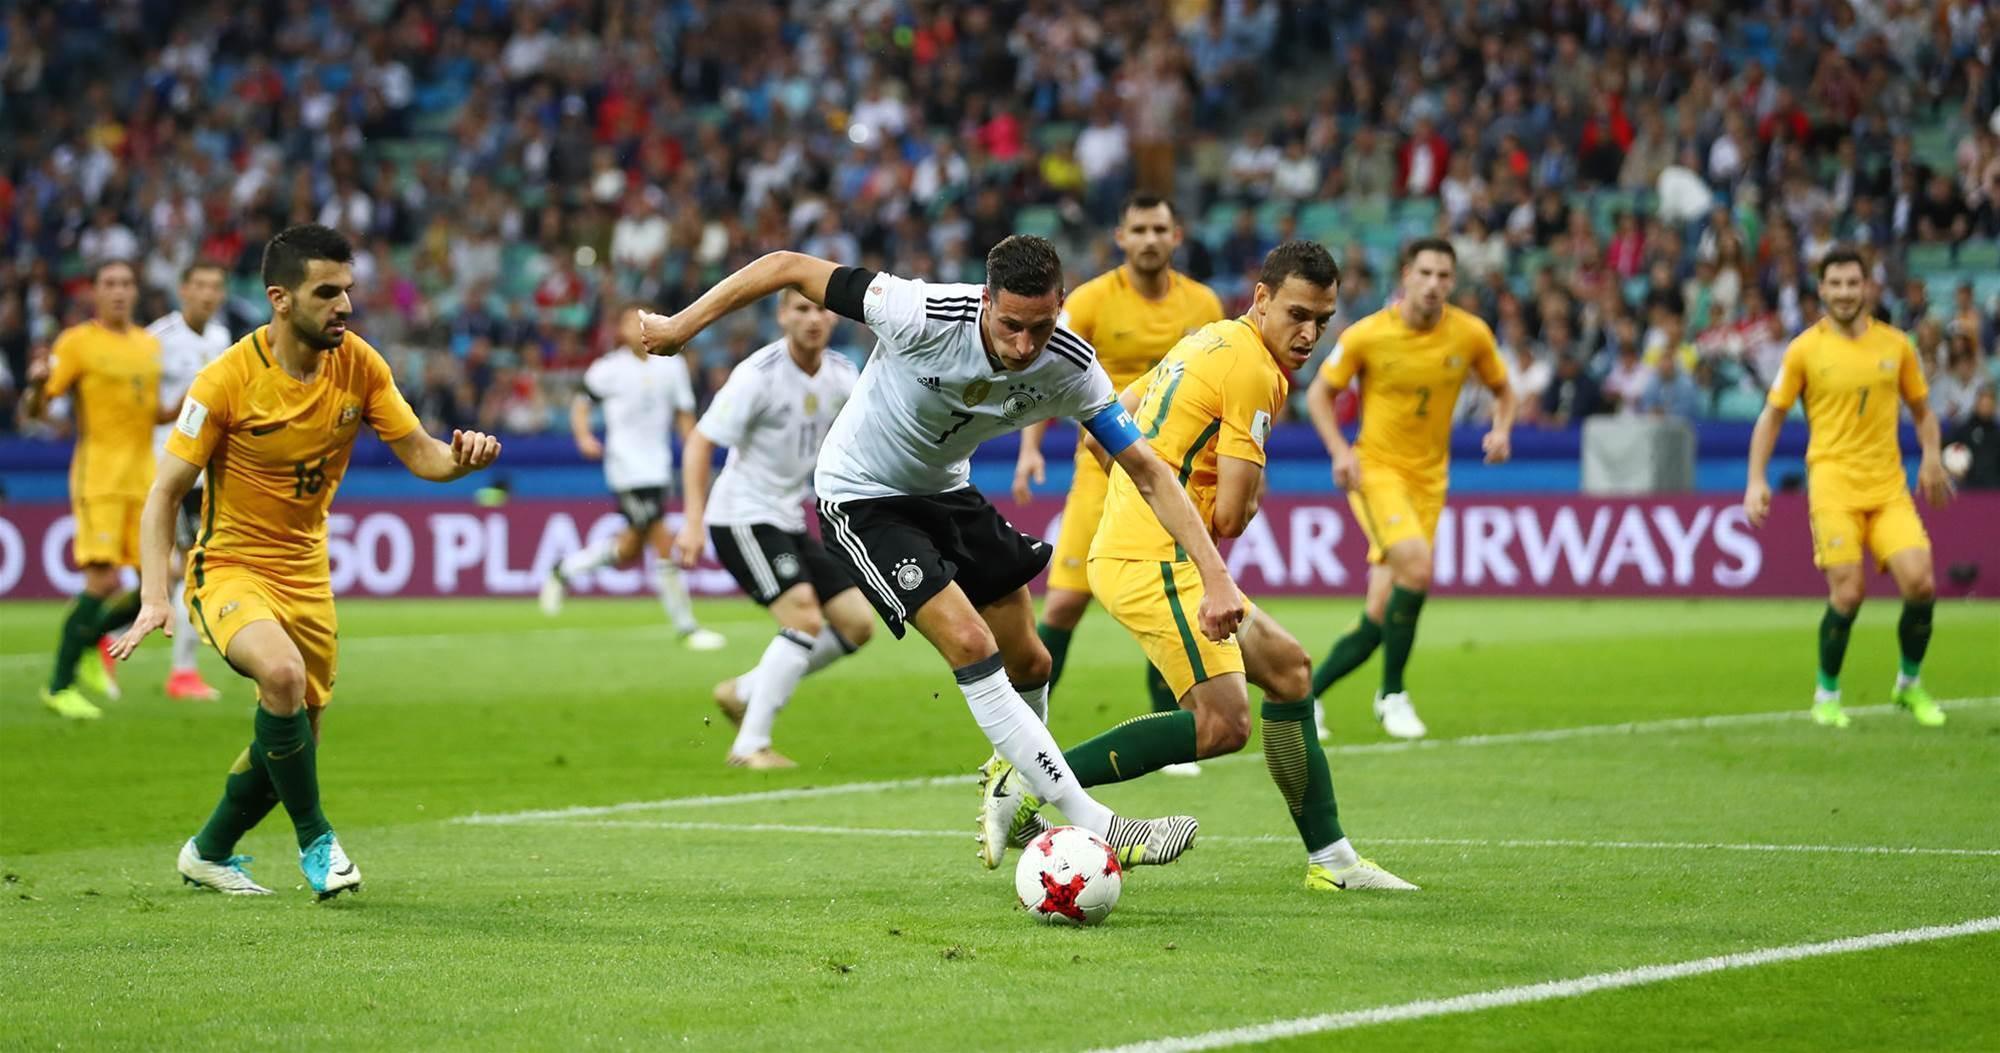 Socceroos v Germany pic special